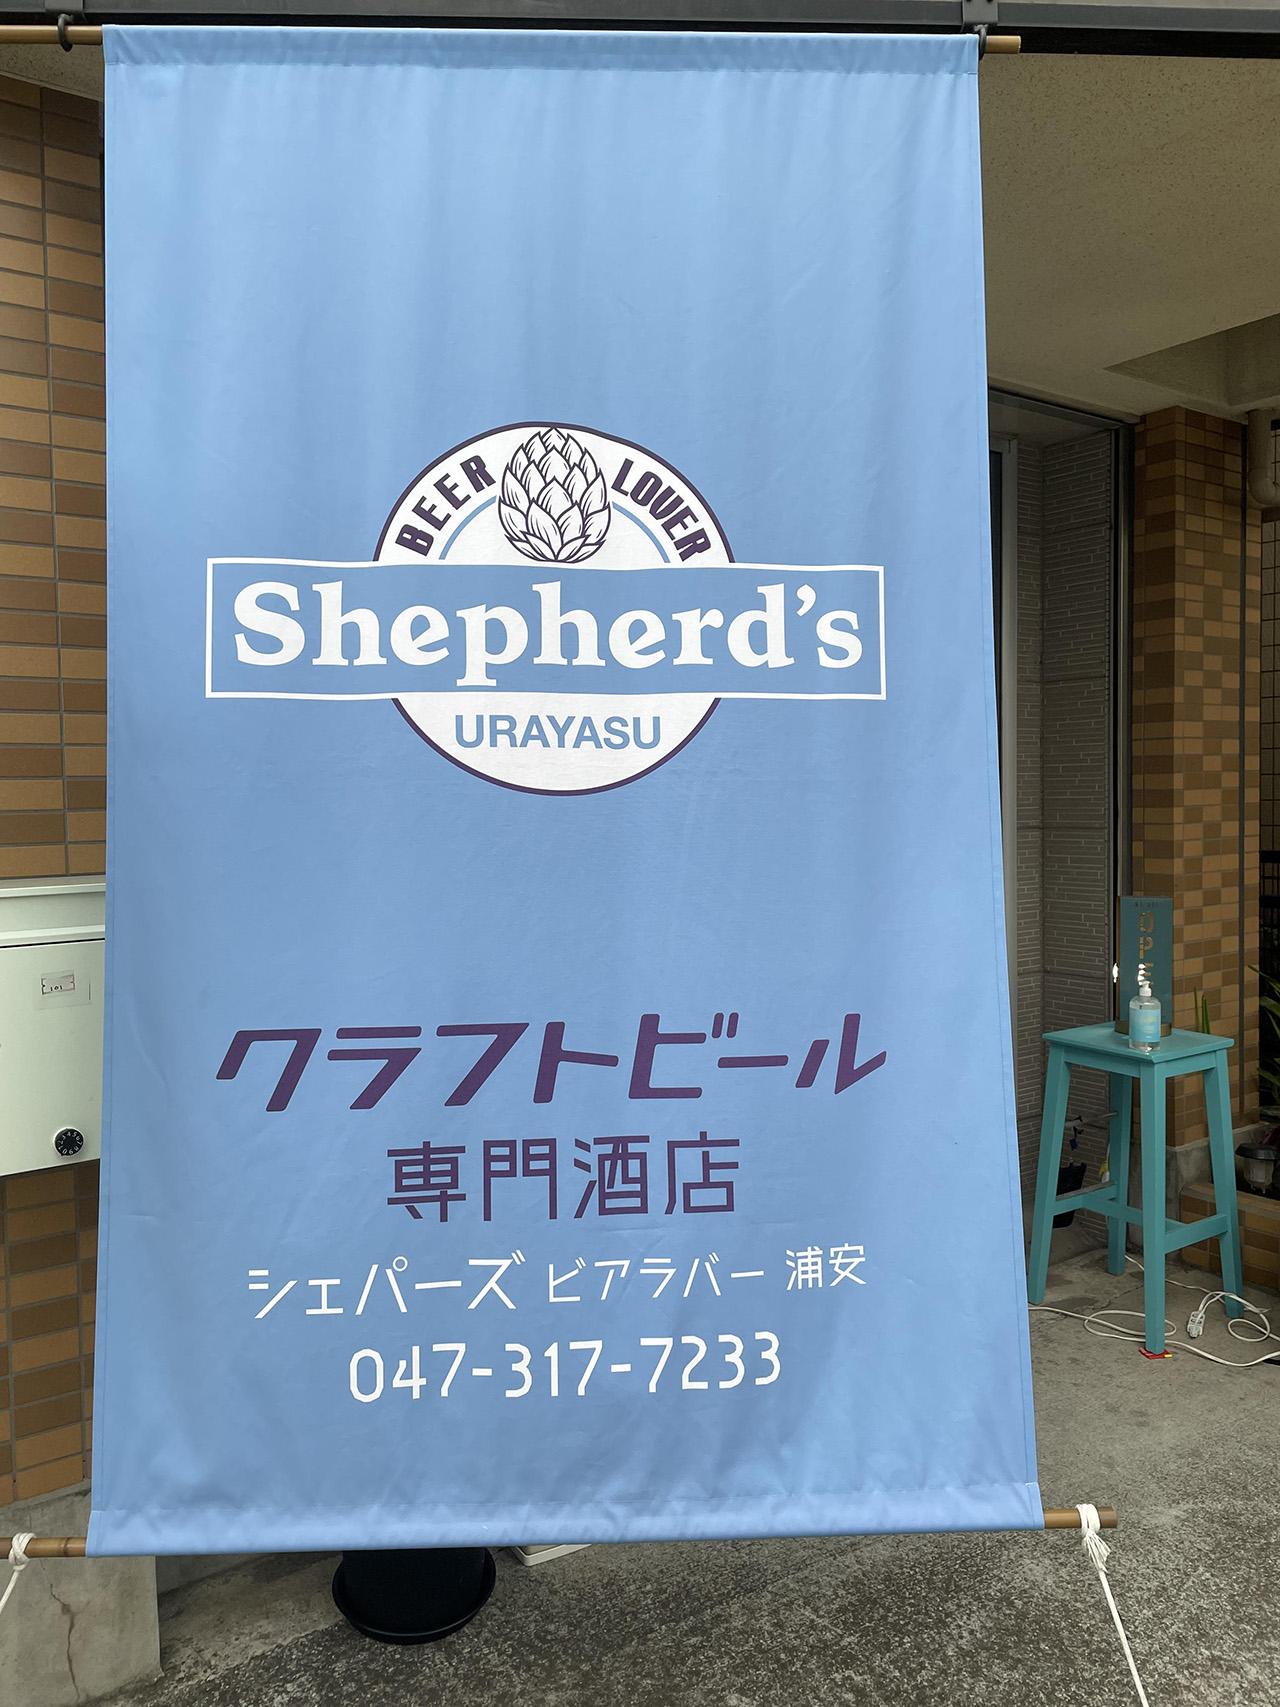 Shepherd's BEER LOVER URAYASU(シェパーズ ビア ラバー浦安)の画像